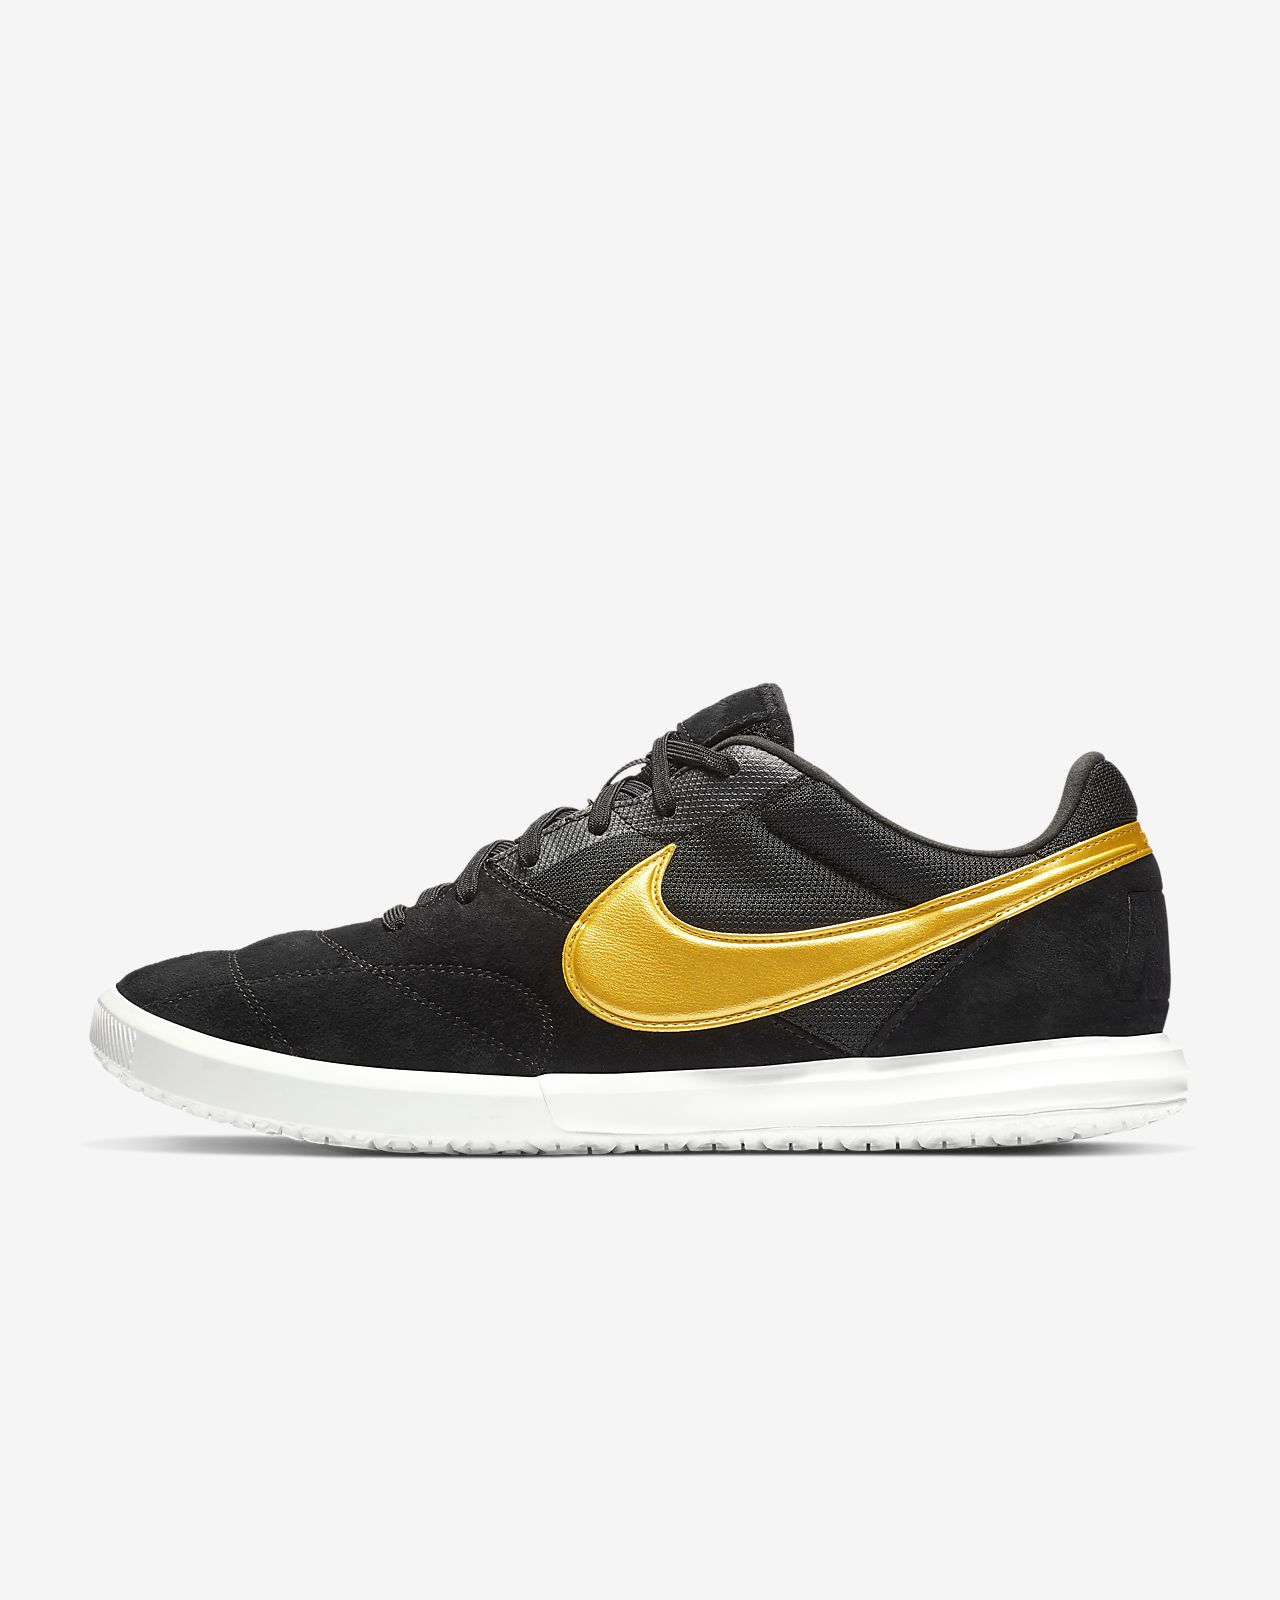 8d6c276436957 Nike Tiempo Premier II Sala Botas de fútbol sala. Nike.com ES